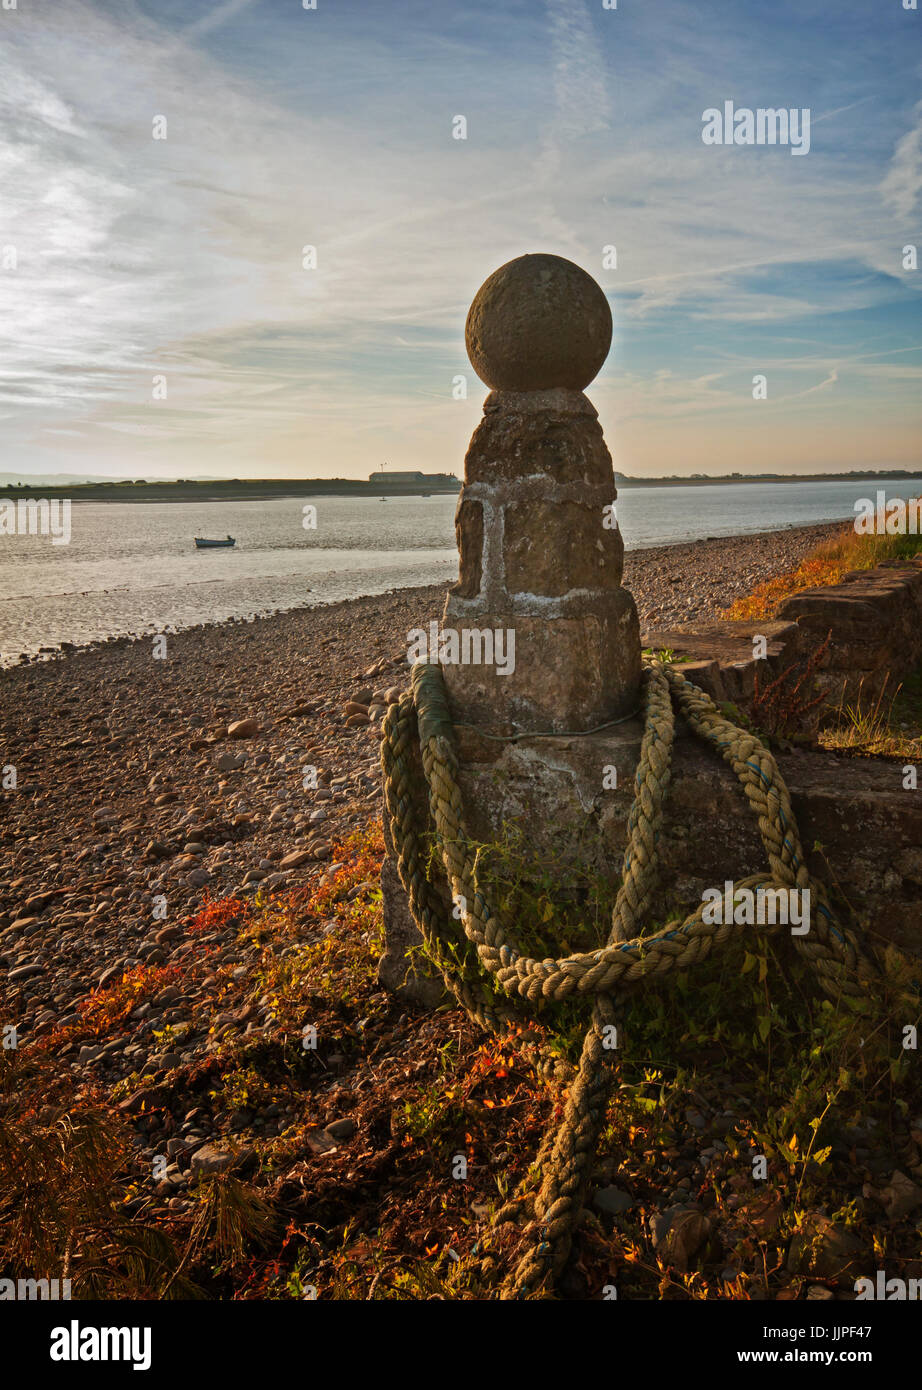 Bollard on the quayside at Sunderland Point Stock Photo